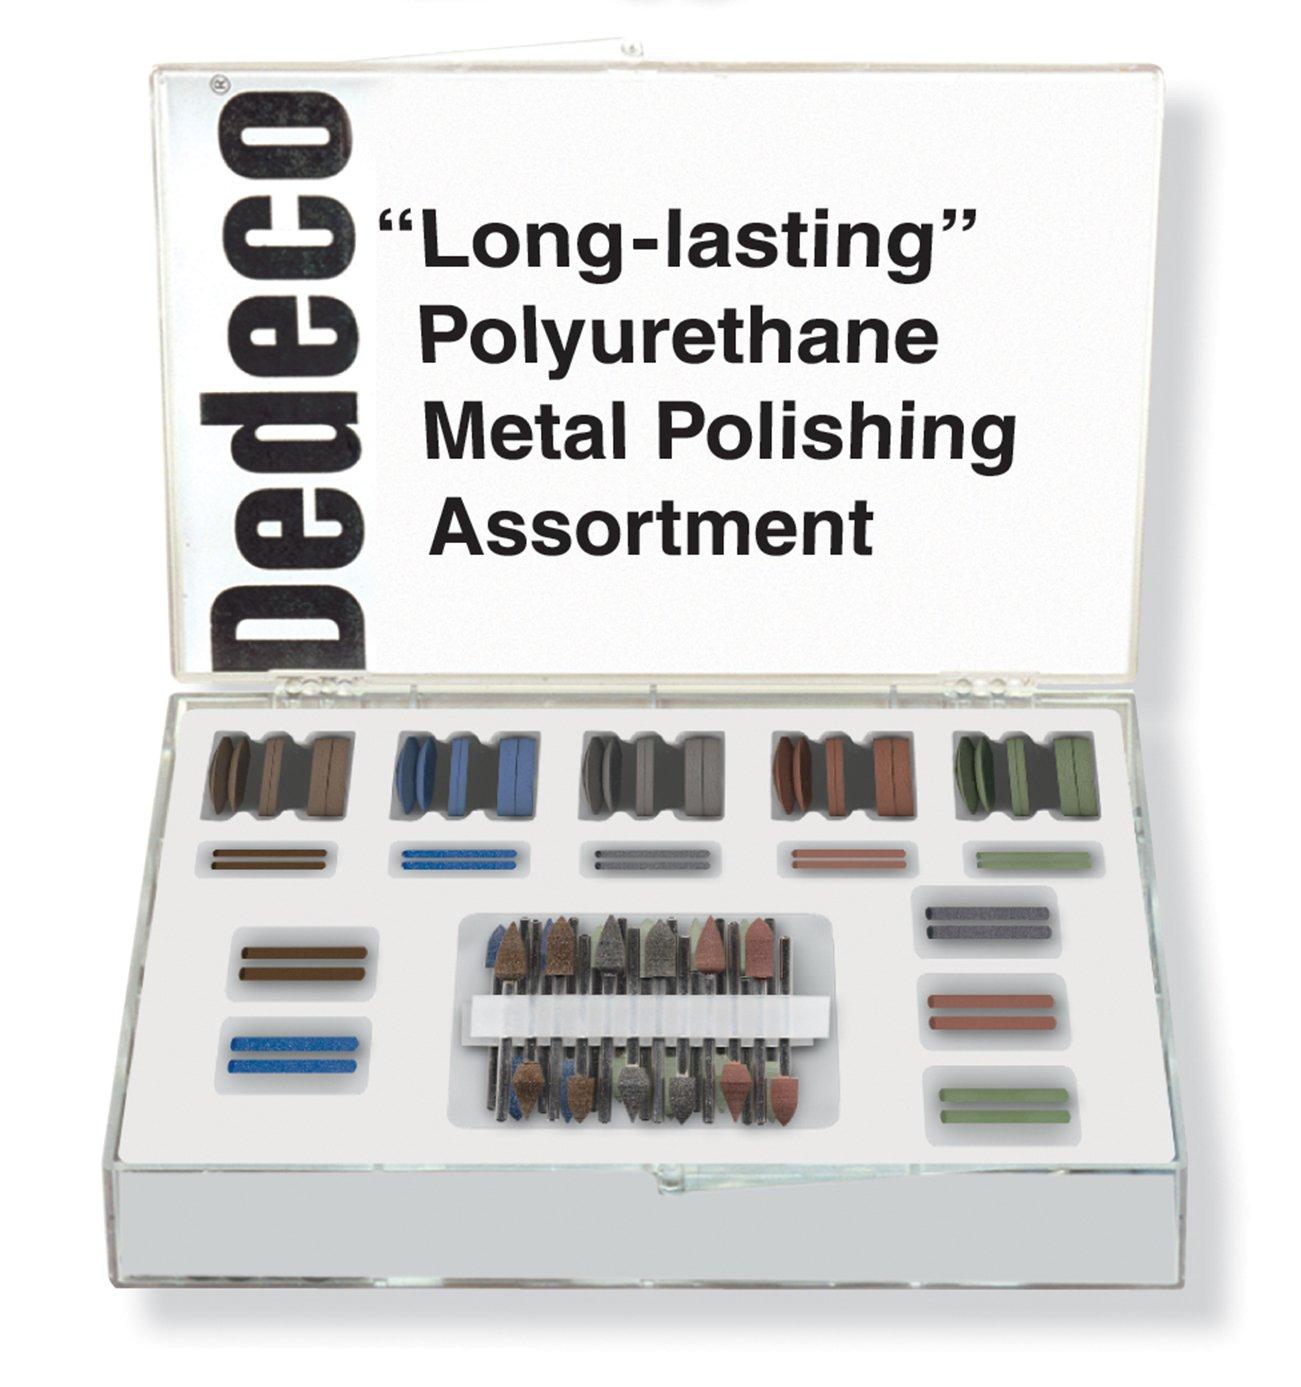 Dedeco 7856 Polyurethane Metal Polishing Kit (Pack of 84)